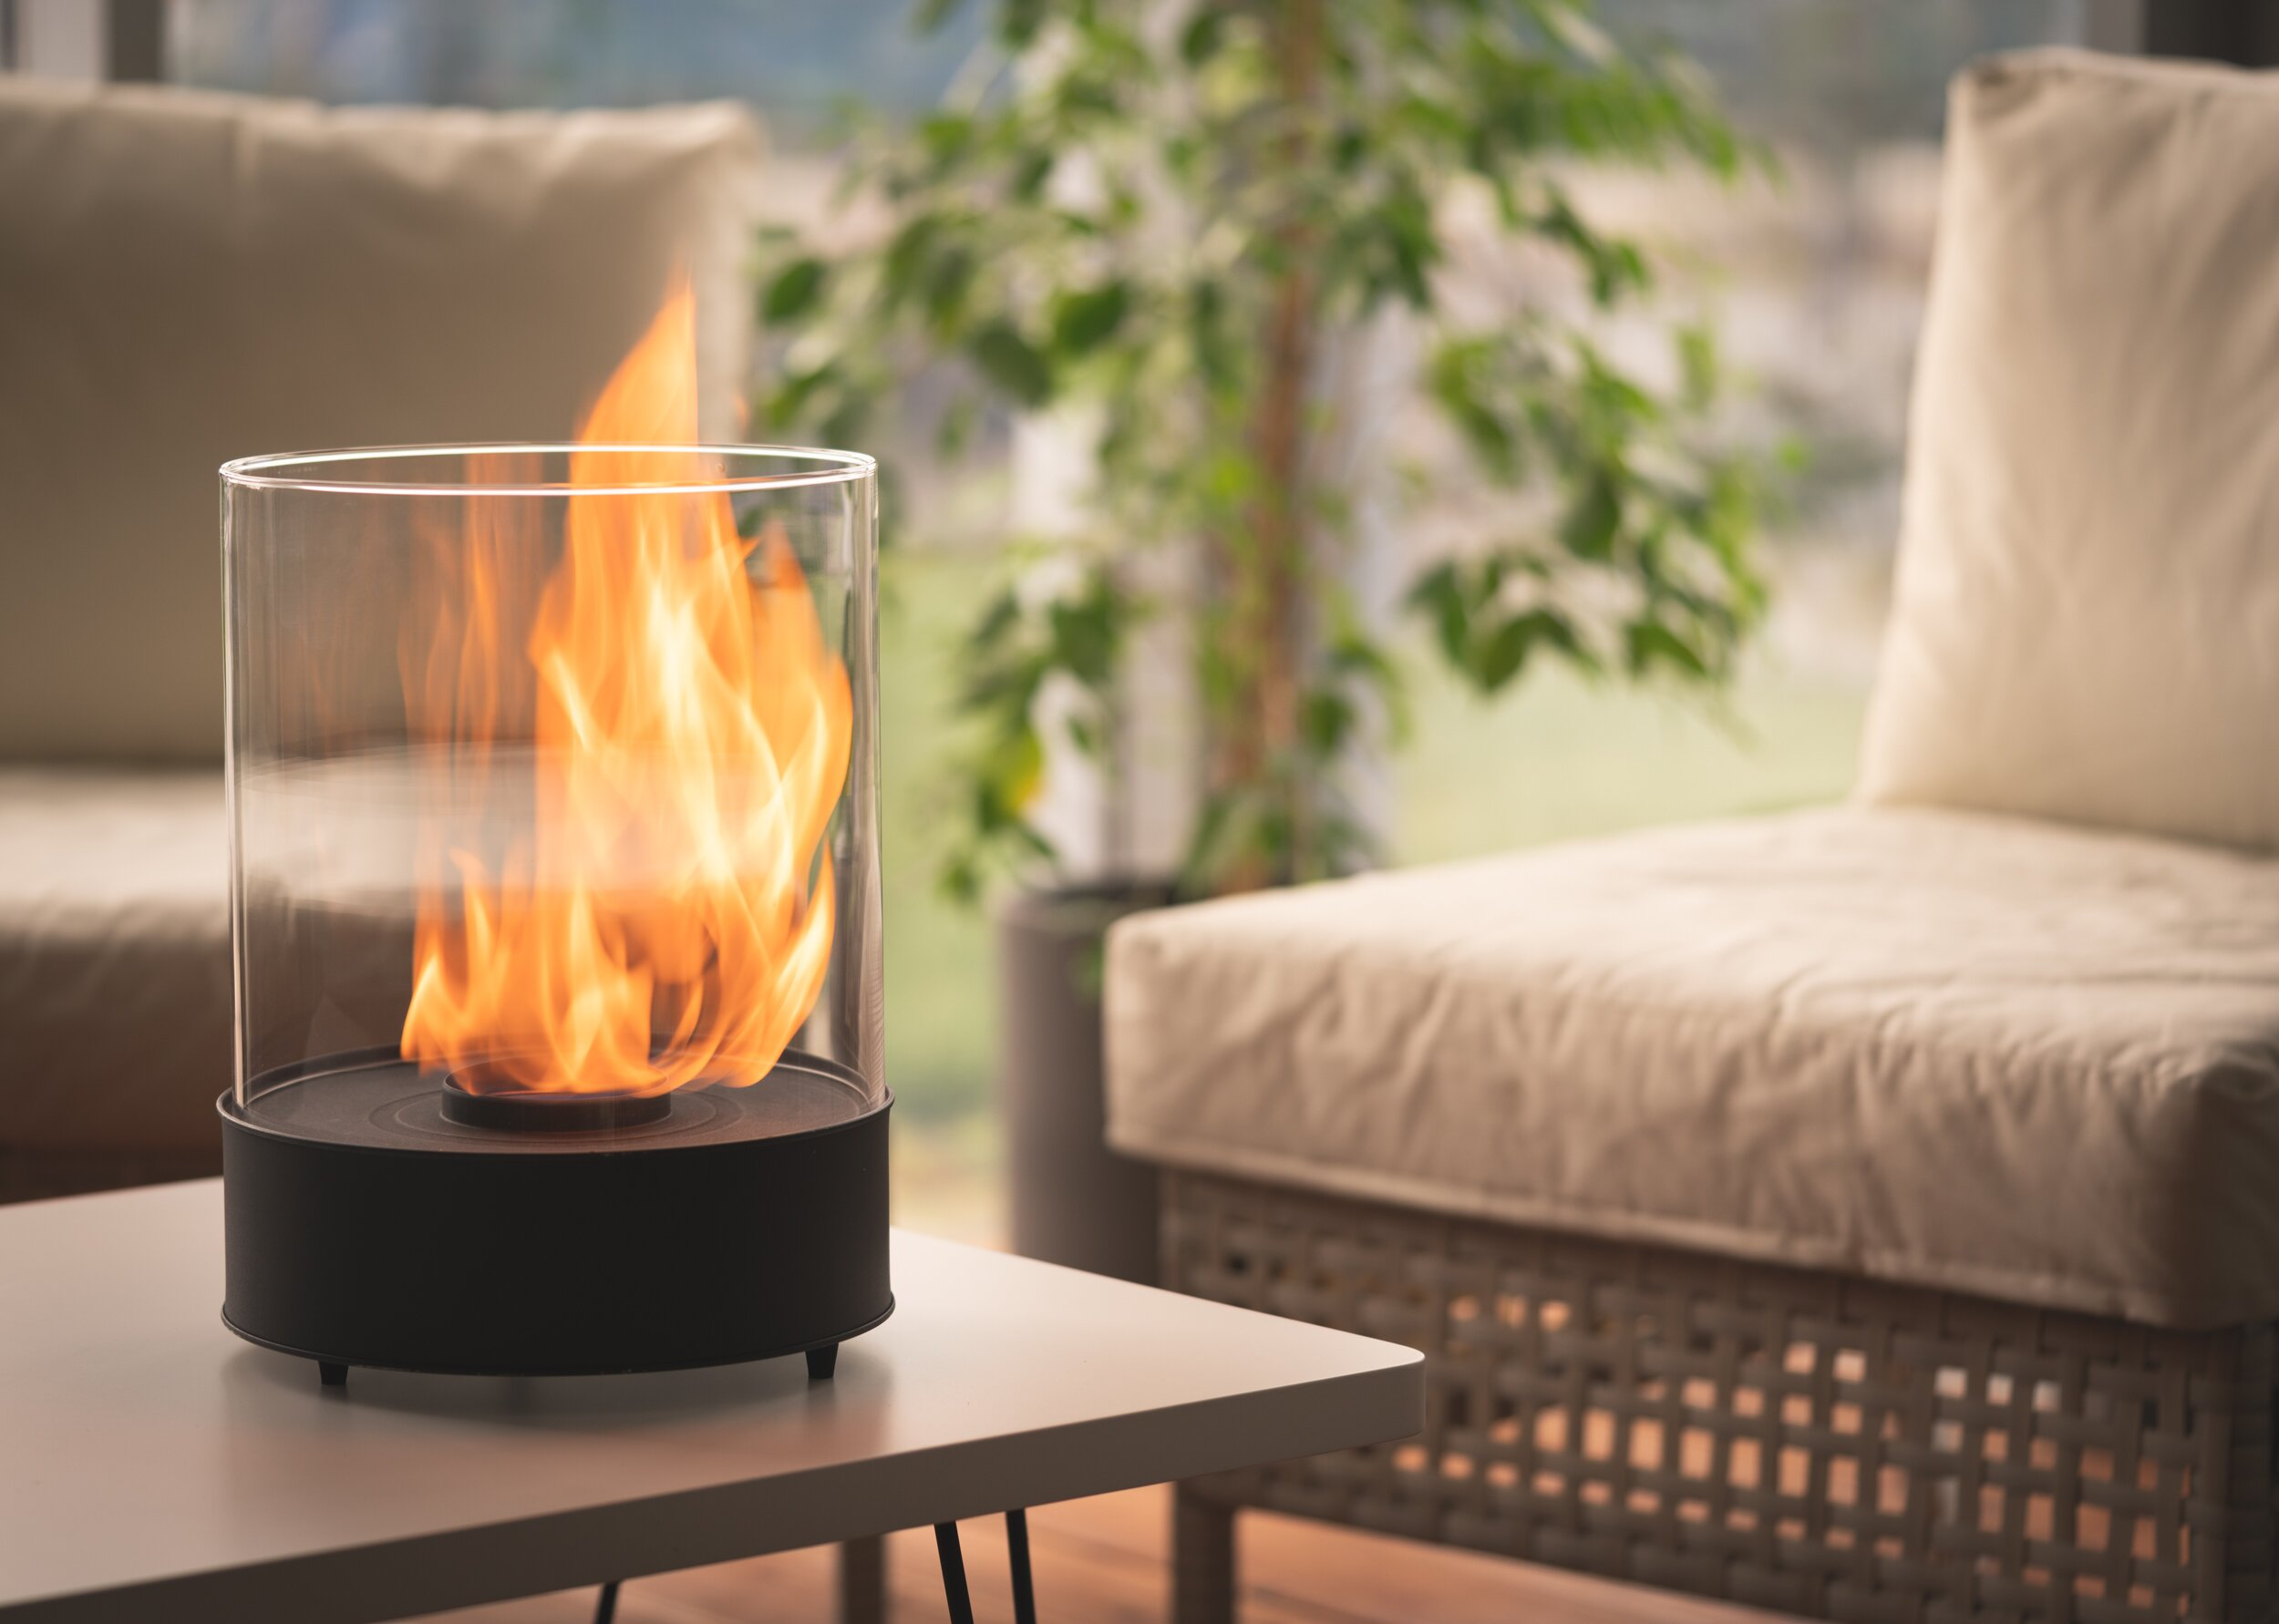 Chantico Glassfire Bio-Ethanol Tabletop Fireplace